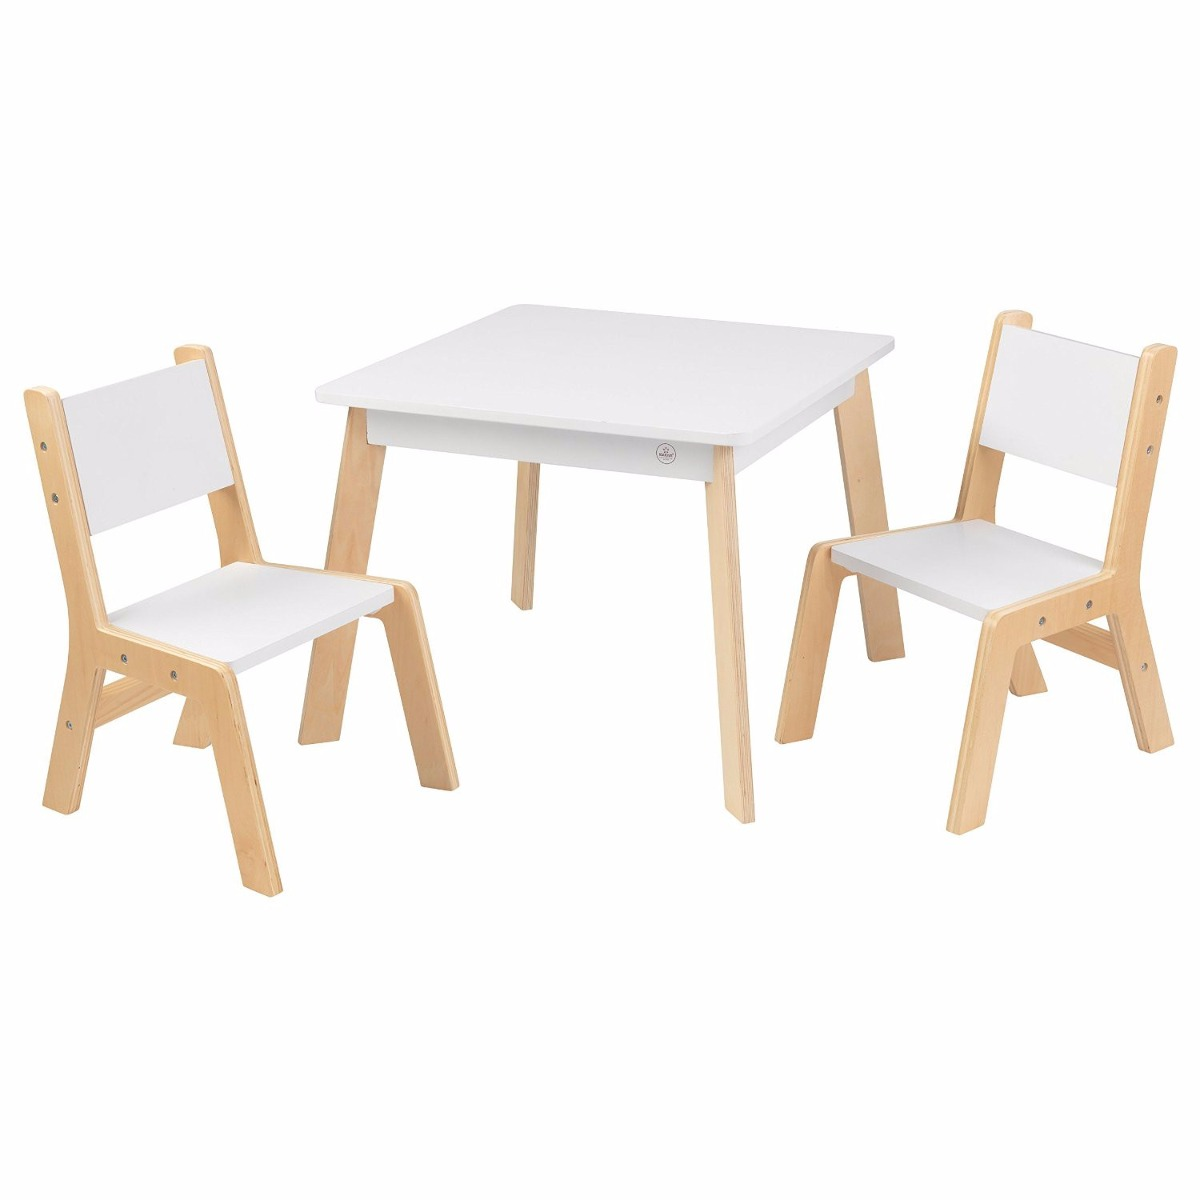 Kidkraft mesita con sillas mesa madera tarea arte infantil - Mesa madera infantil ...